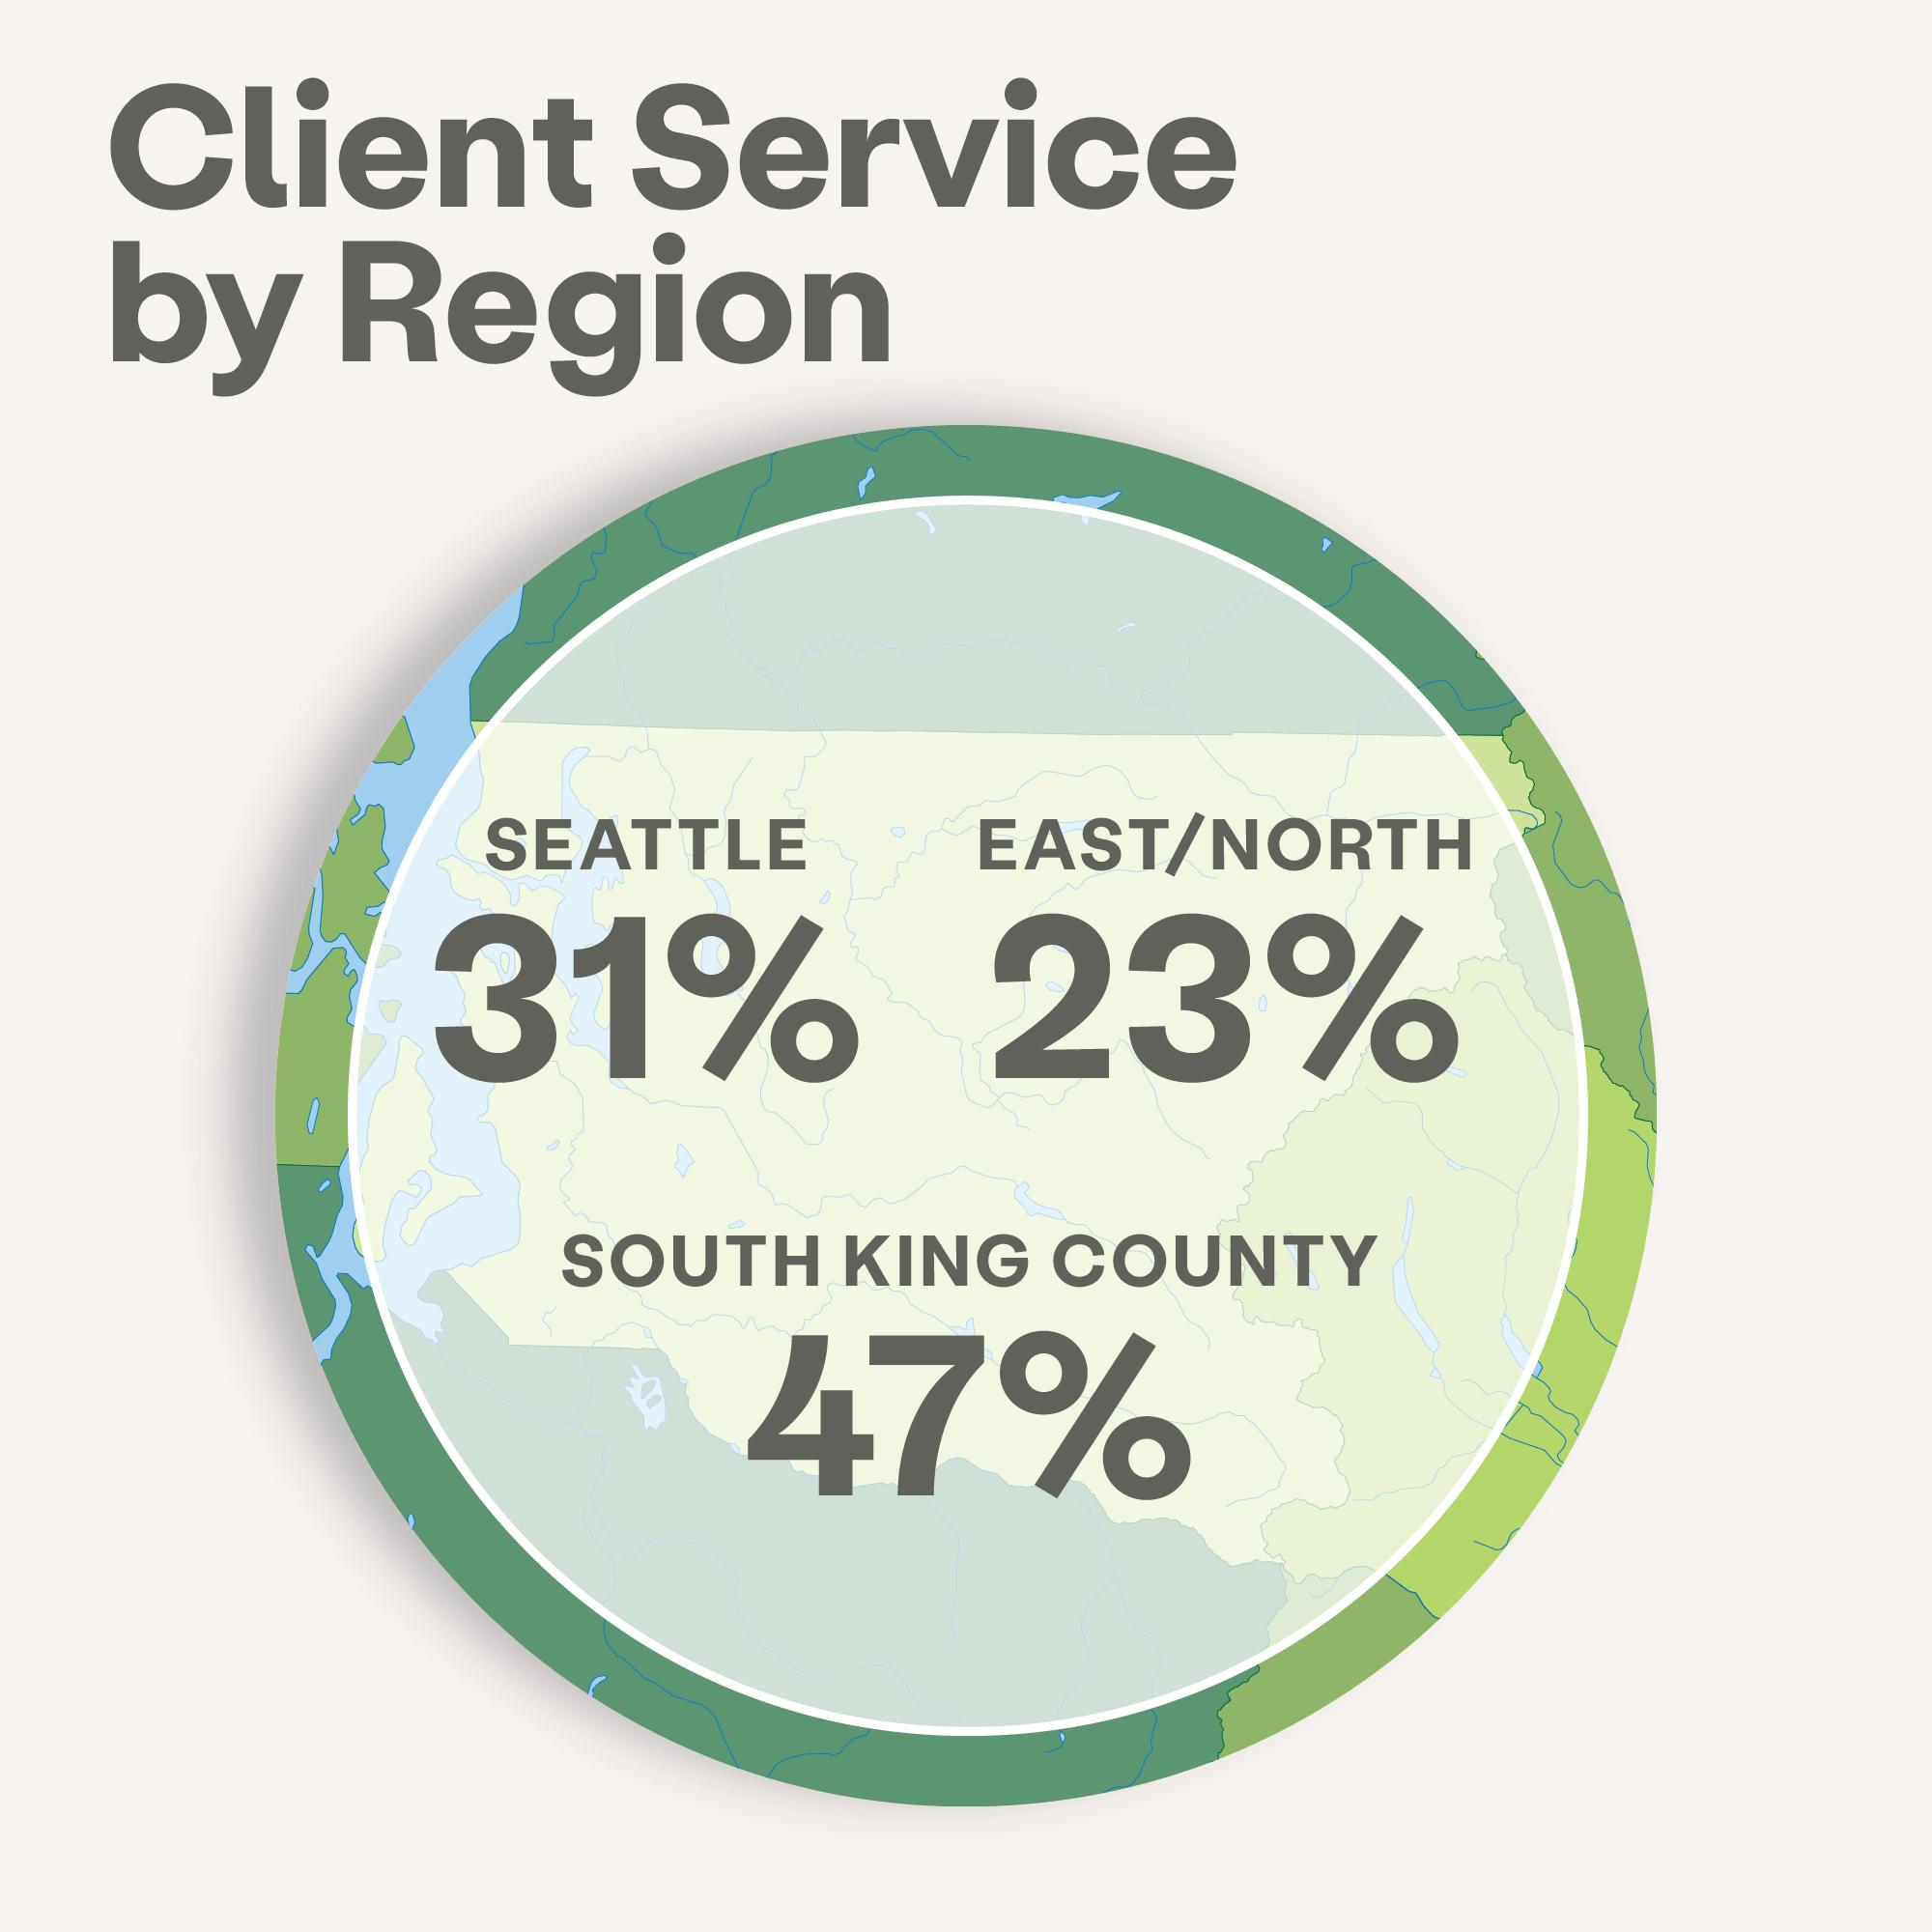 regional service impact image